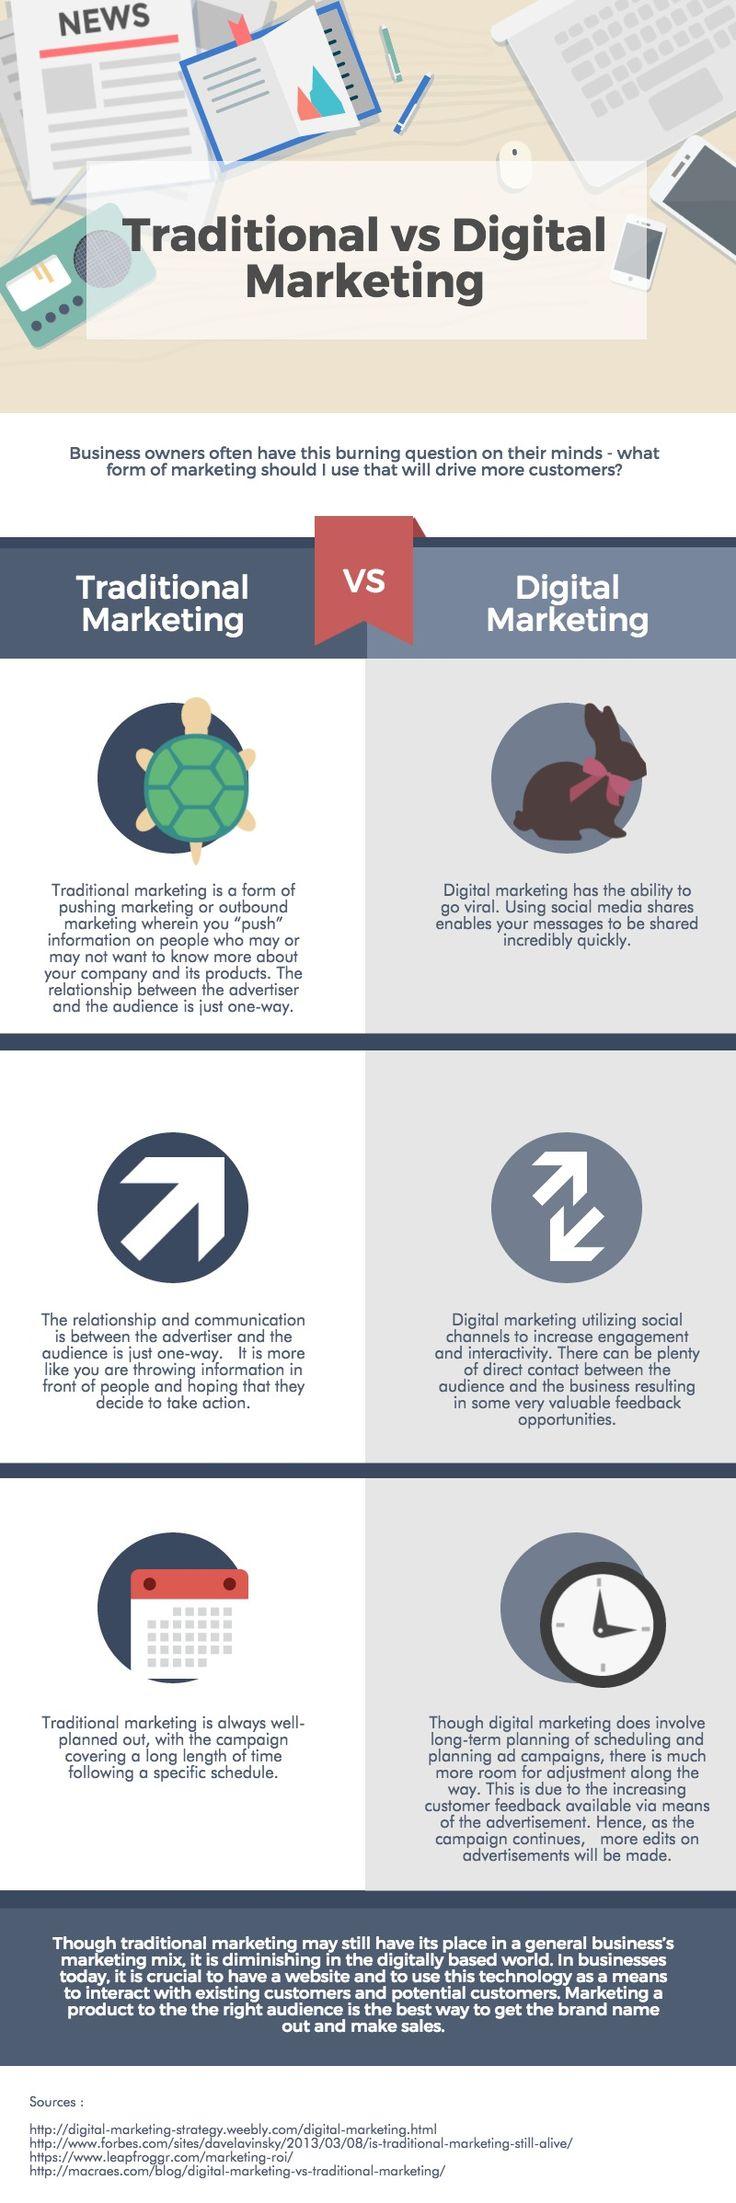 28 best presentation images on pinterest infographic graph design and graphics. Black Bedroom Furniture Sets. Home Design Ideas